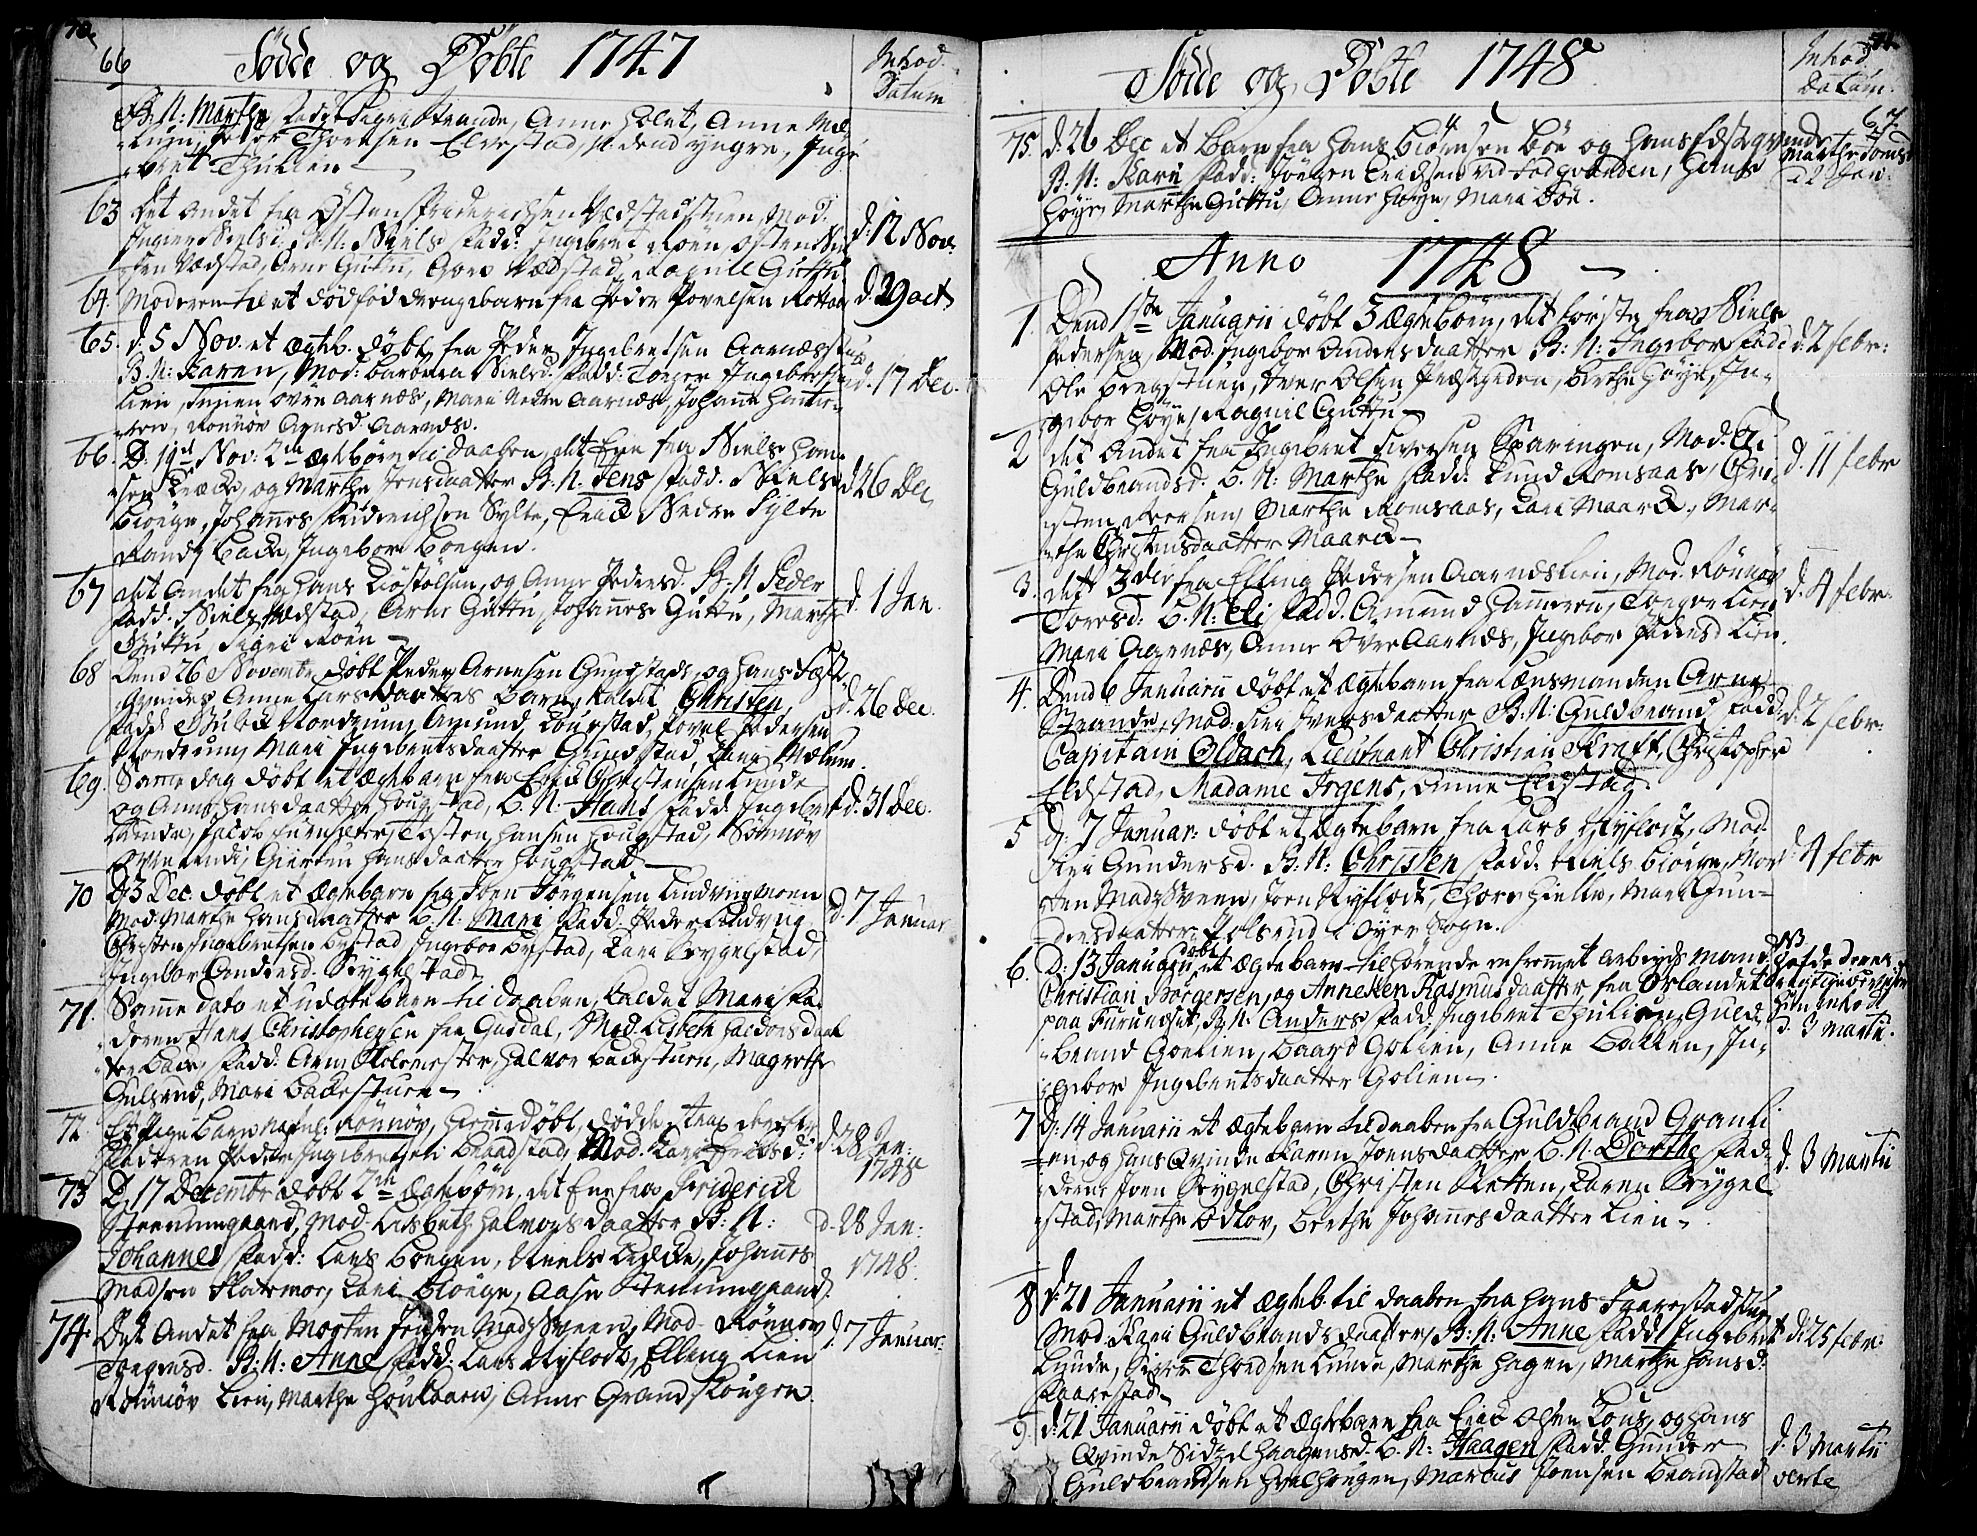 SAH, Ringebu prestekontor, Ministerialbok nr. 2, 1734-1780, s. 66-67